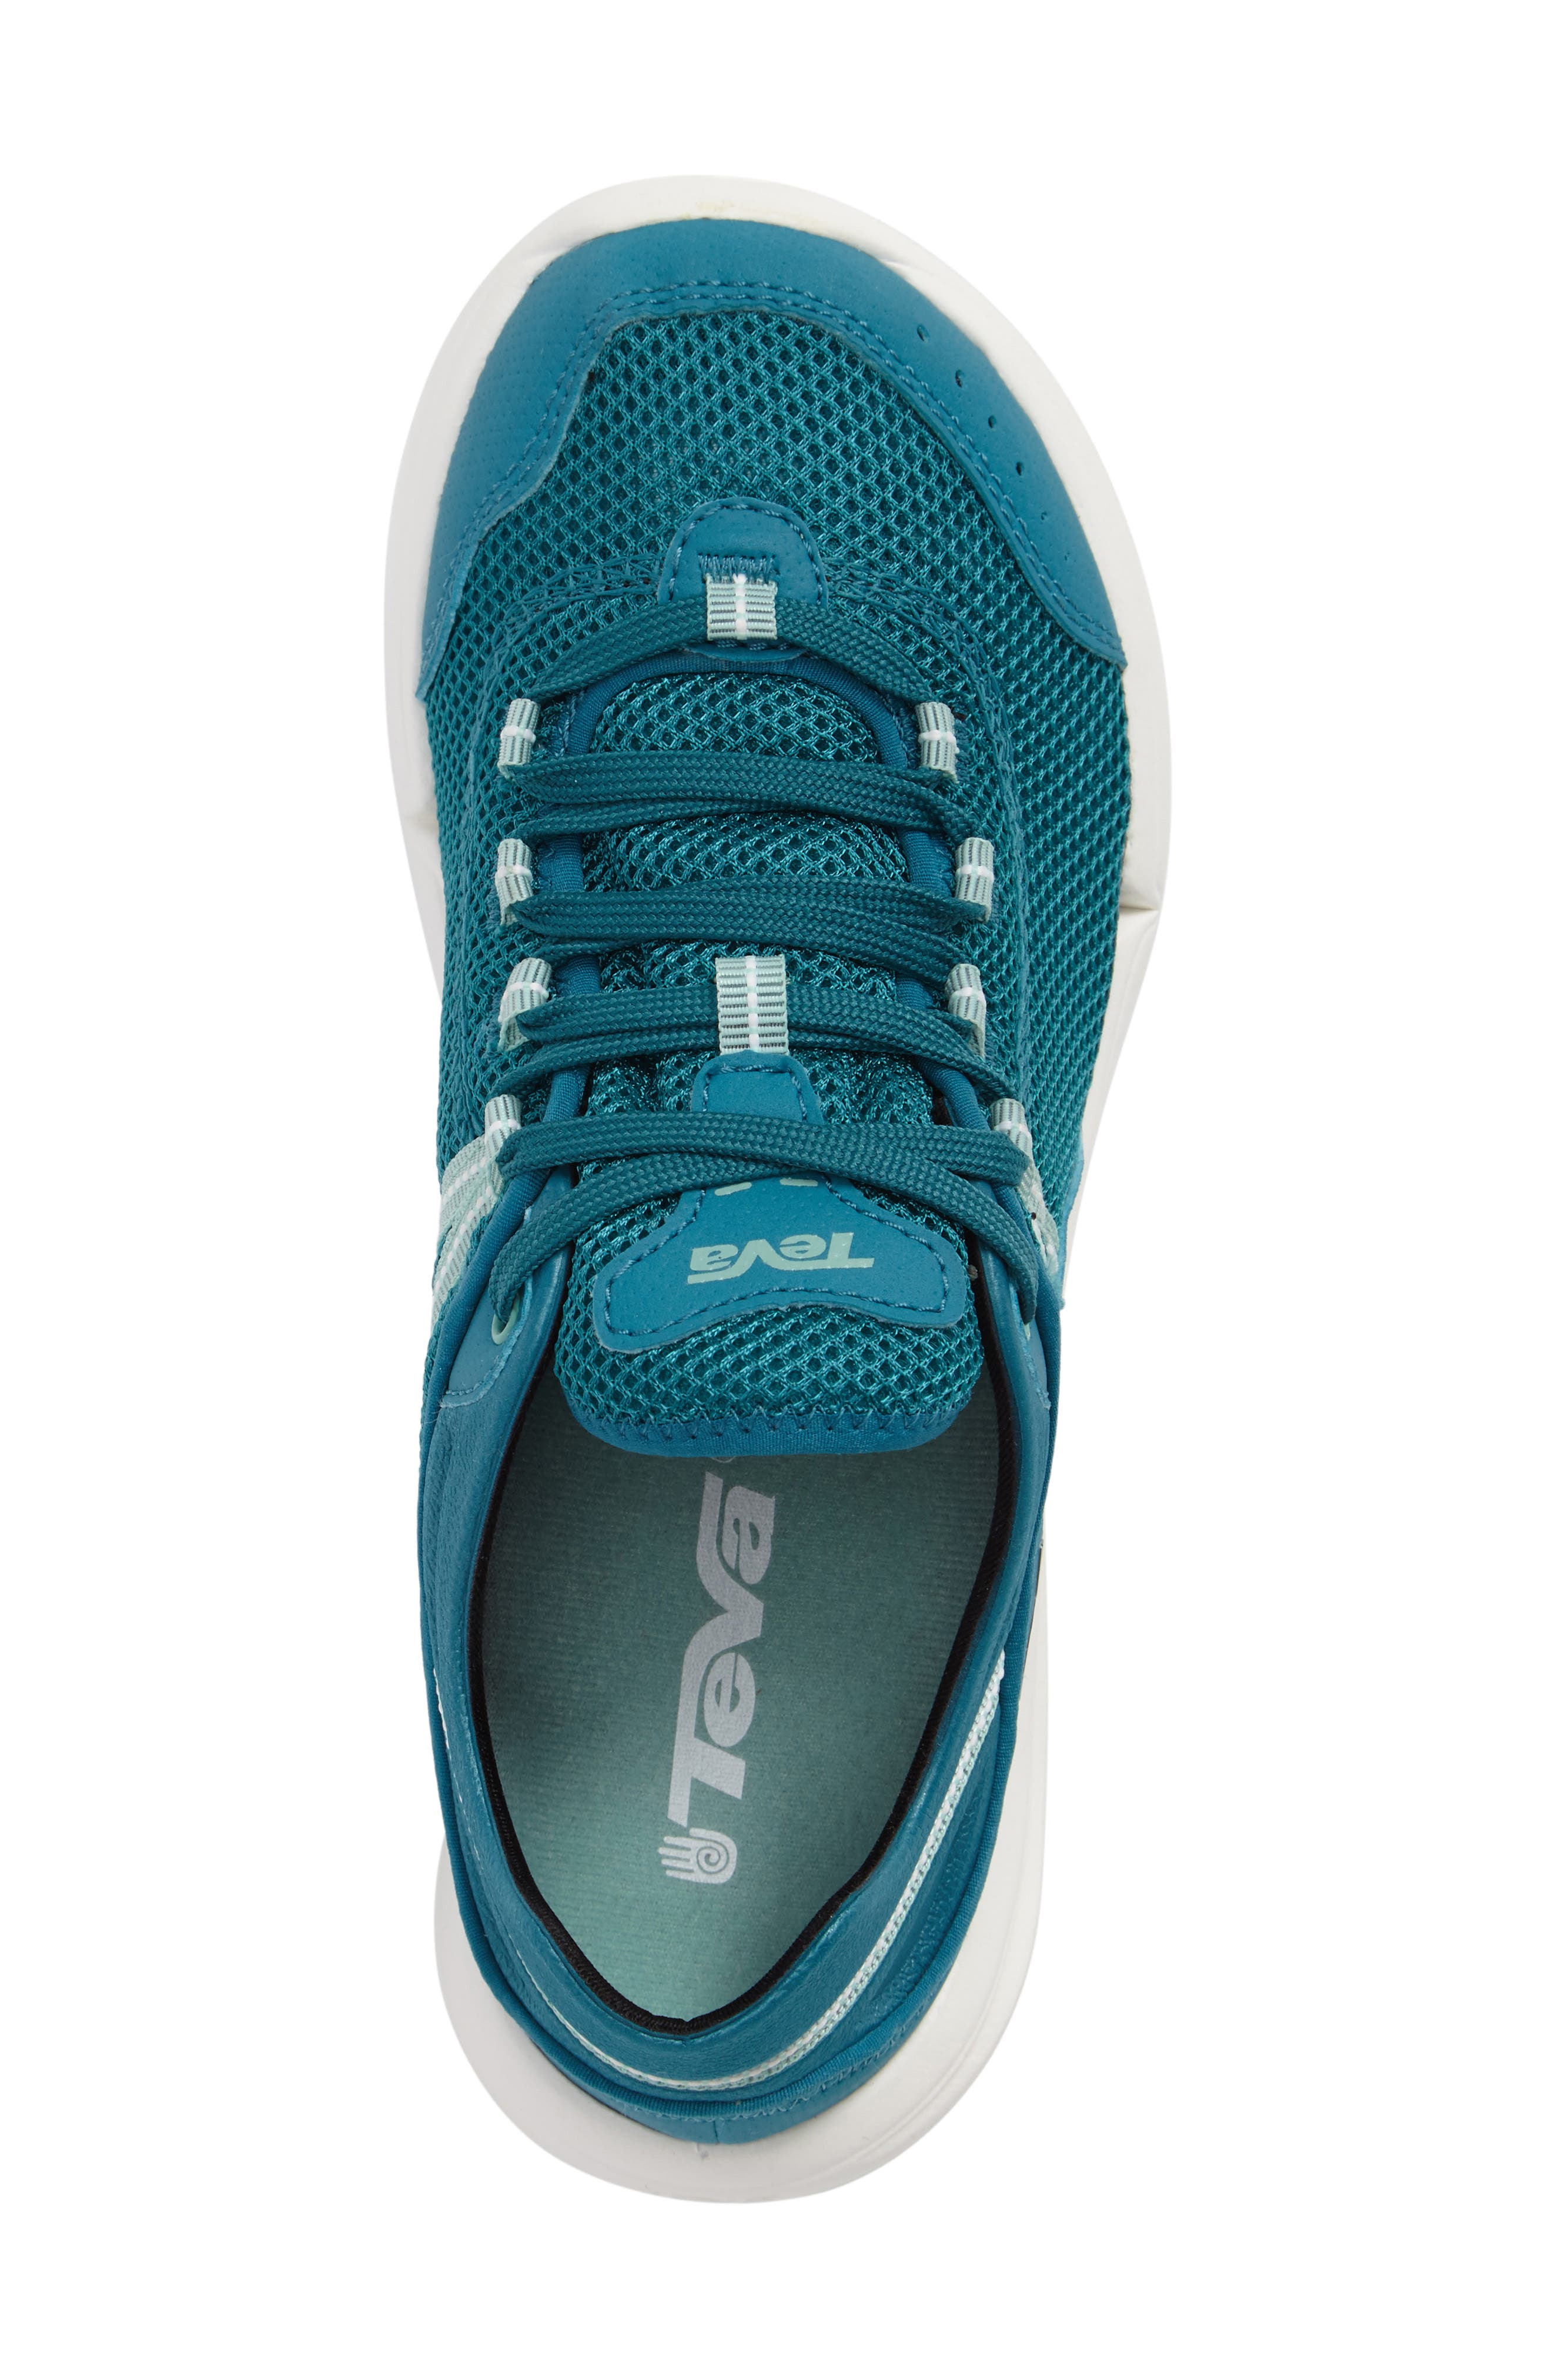 Evo Sneaker,                             Alternate thumbnail 3, color,                             Blue Fabric